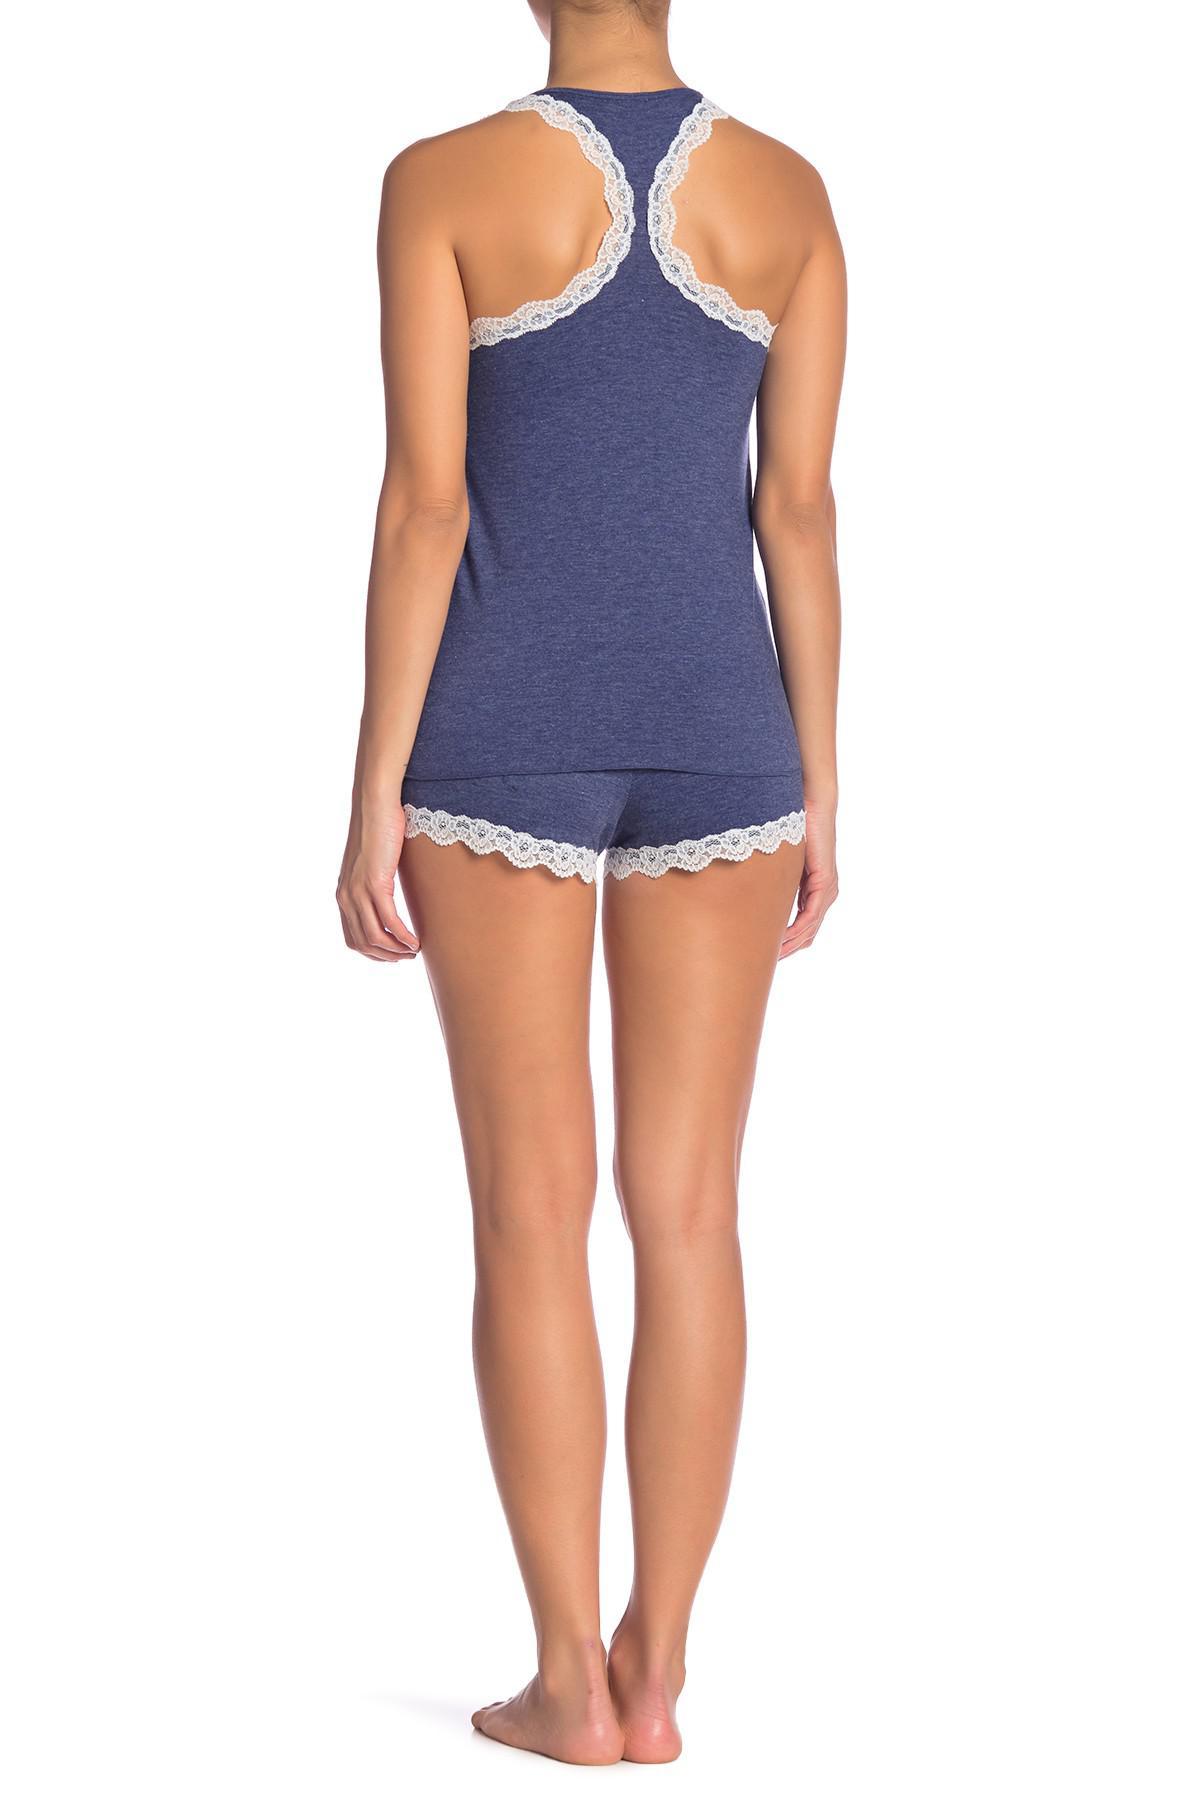 0e068f2618 Lyst - Honeydew Intimates All American Short Pajama Set in Blue